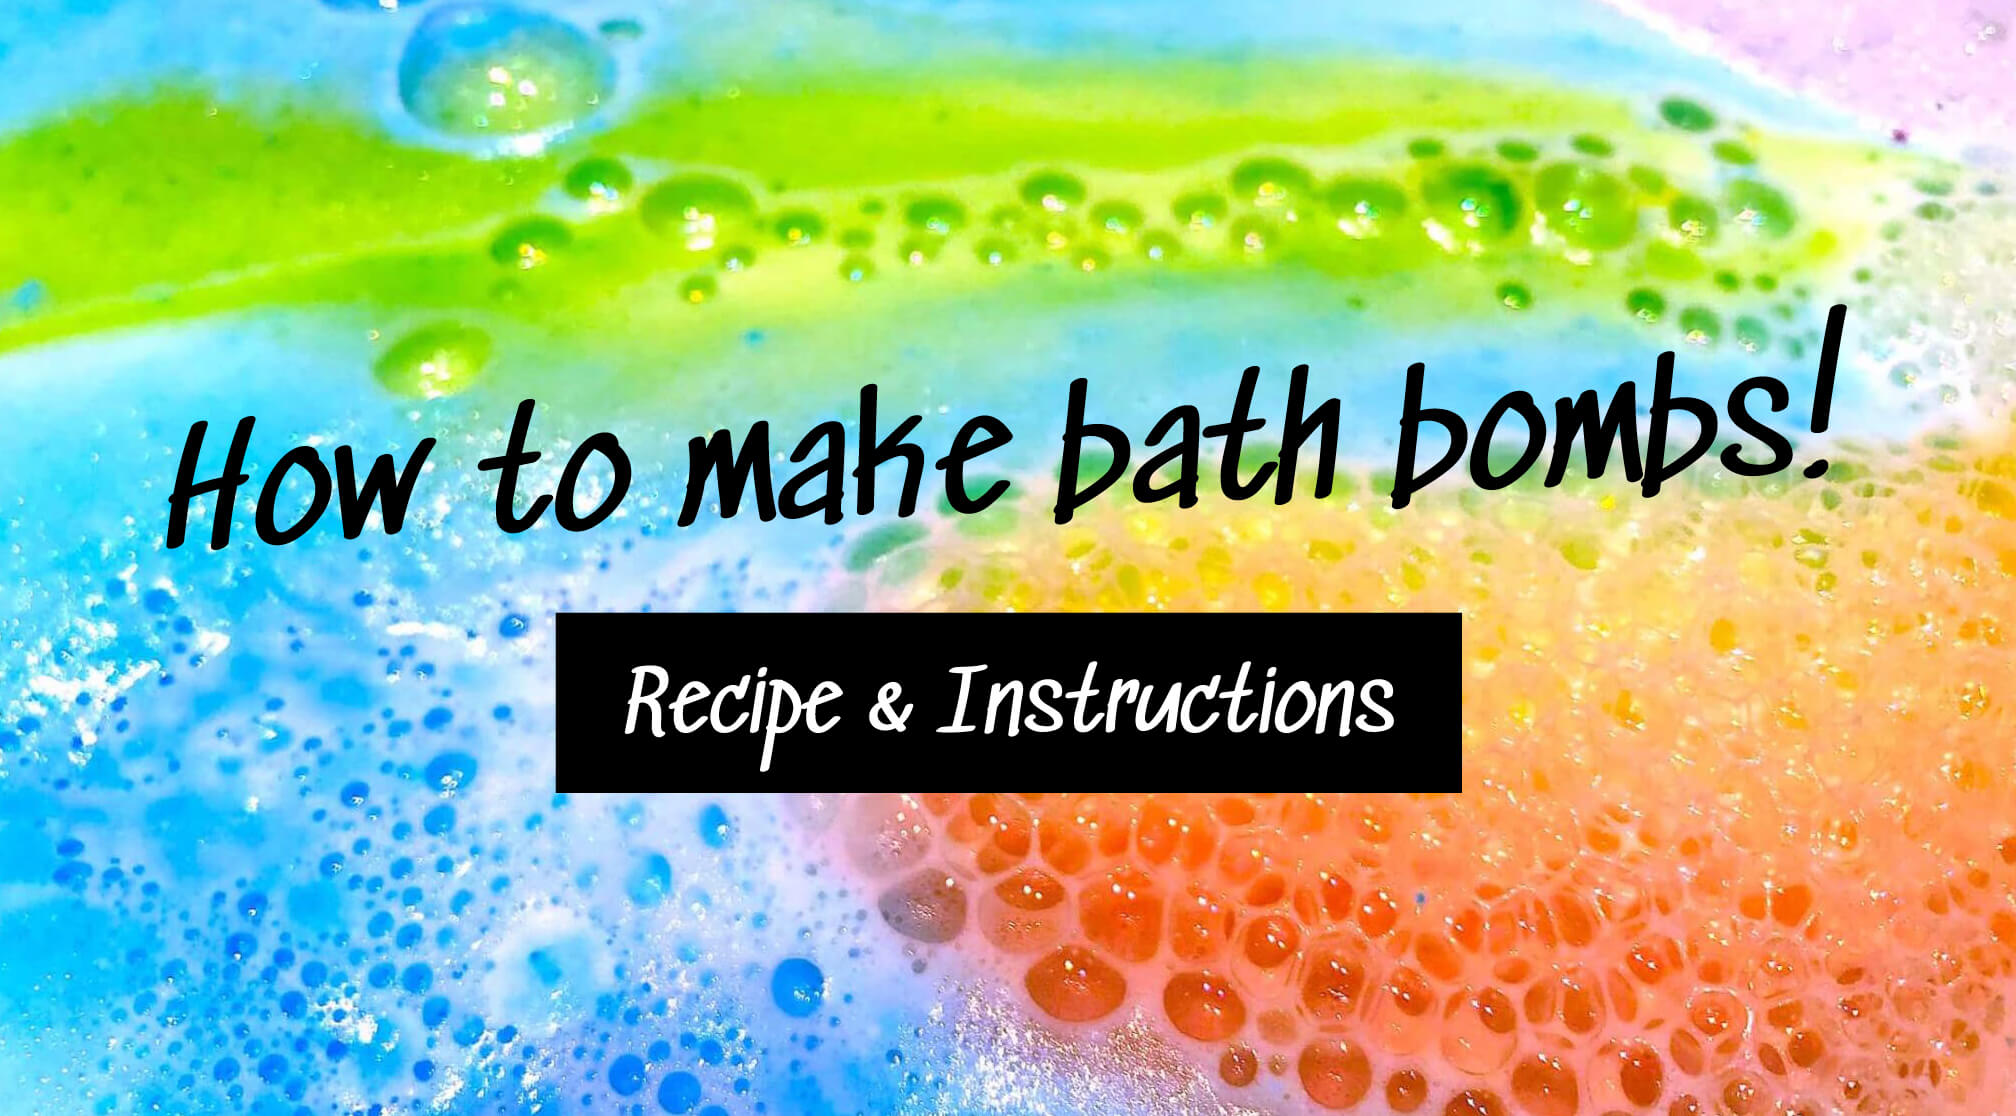 How to Make Bath Bombs 2